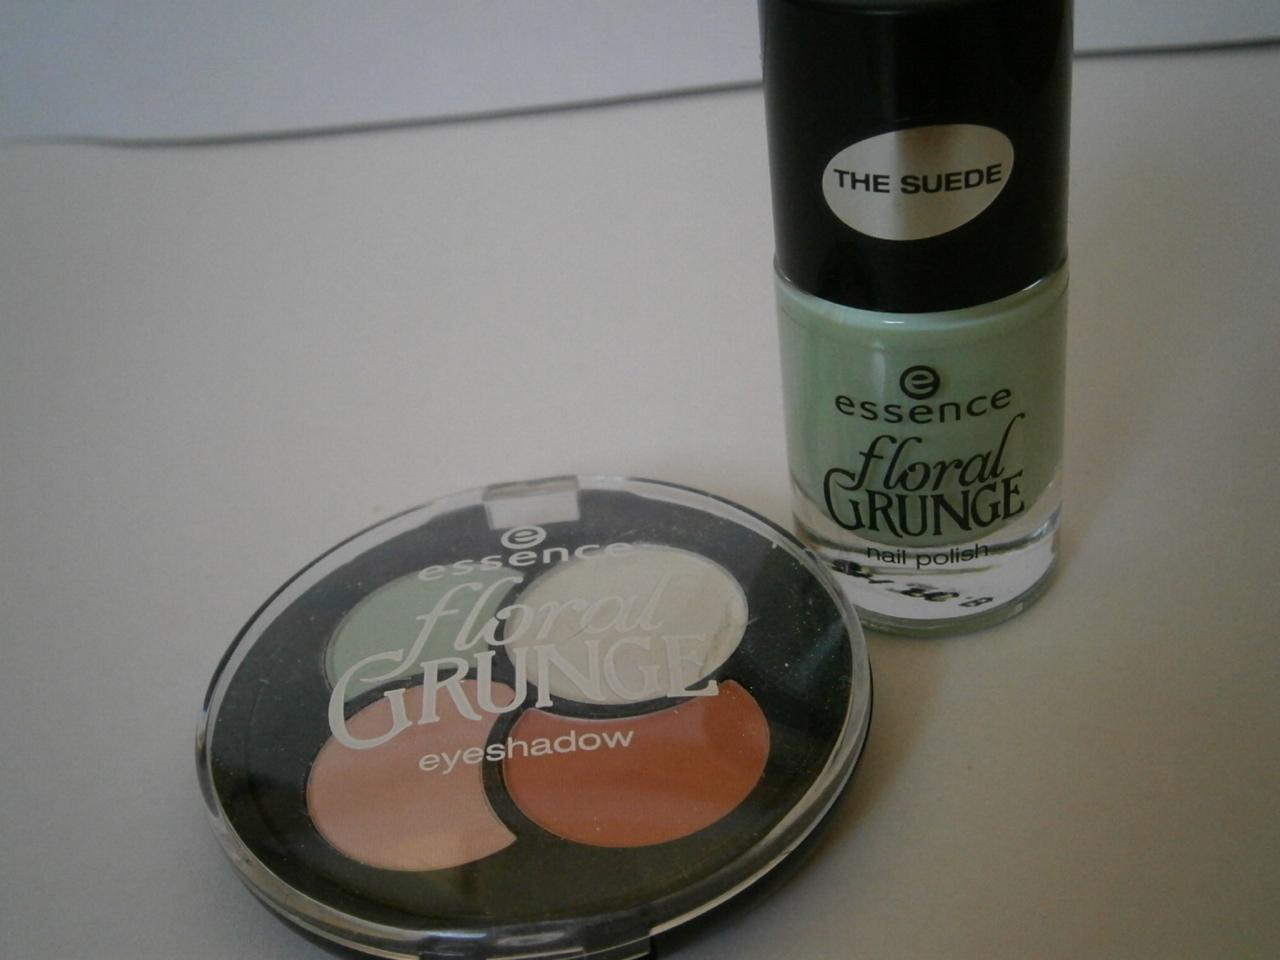 make up und beauty boxxx essence eyeshadow 01 aus der floral grunge le. Black Bedroom Furniture Sets. Home Design Ideas